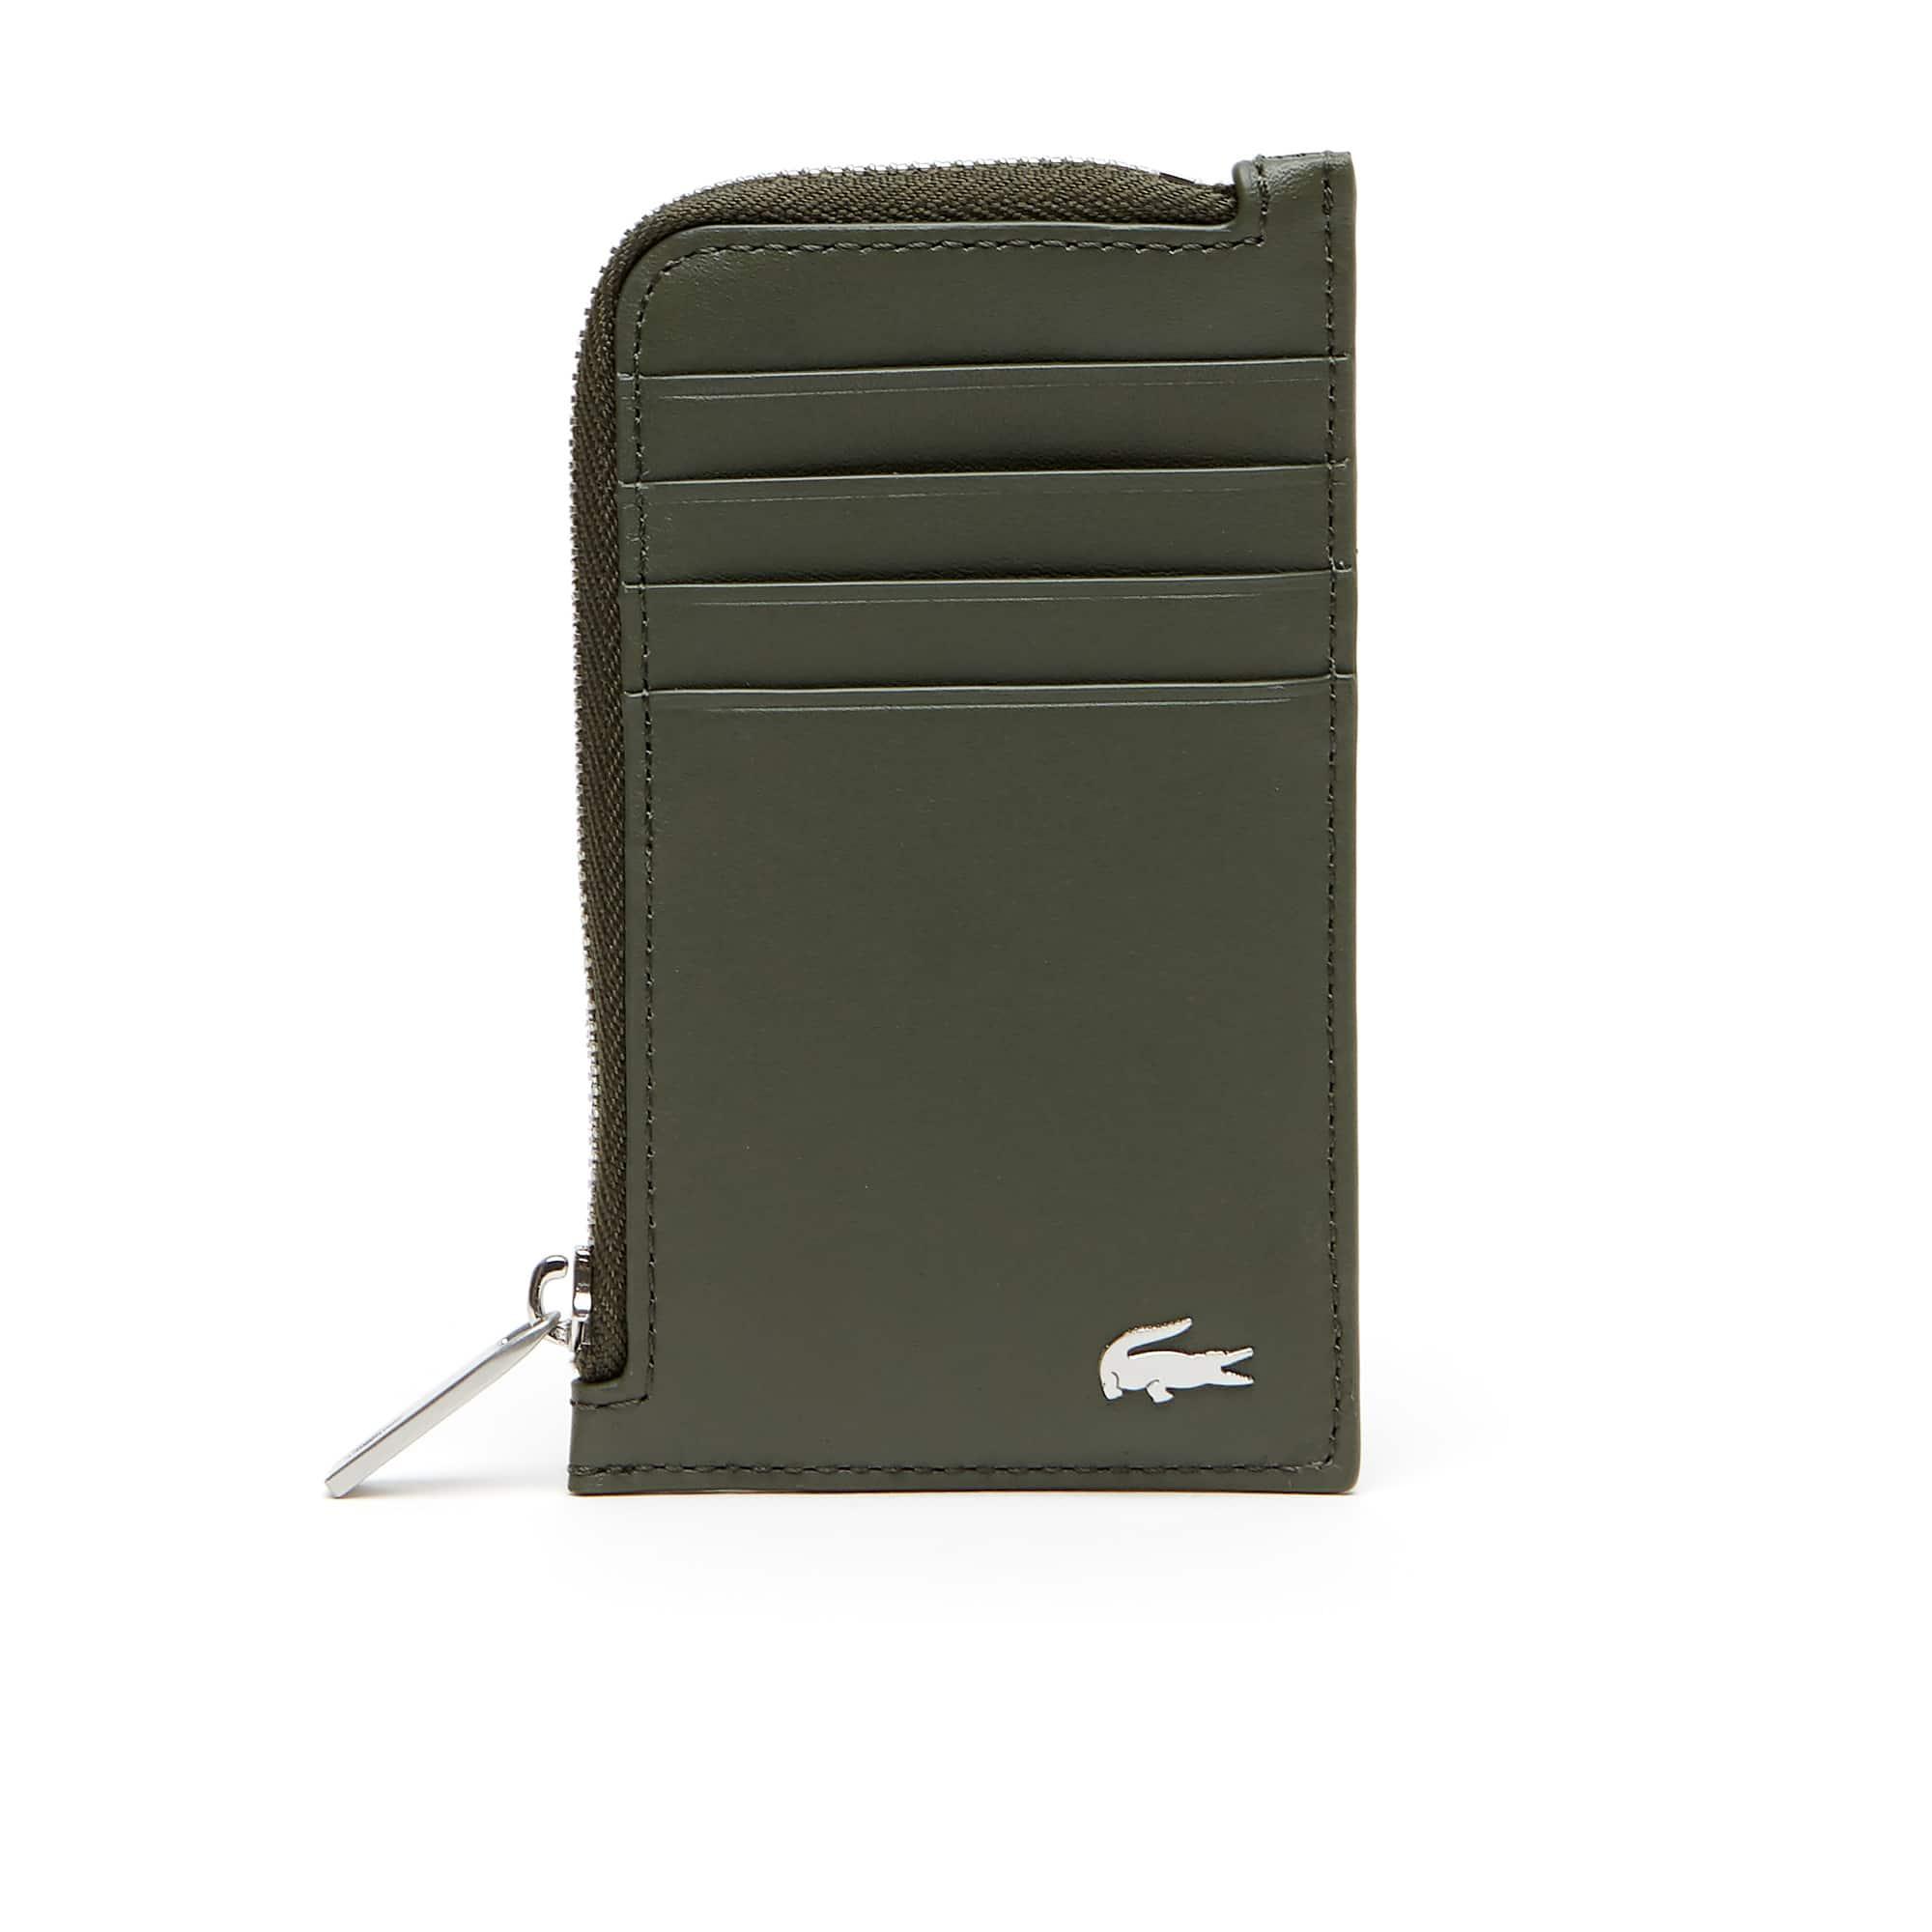 Men's Fitzgerald Leather Zip Card Holder